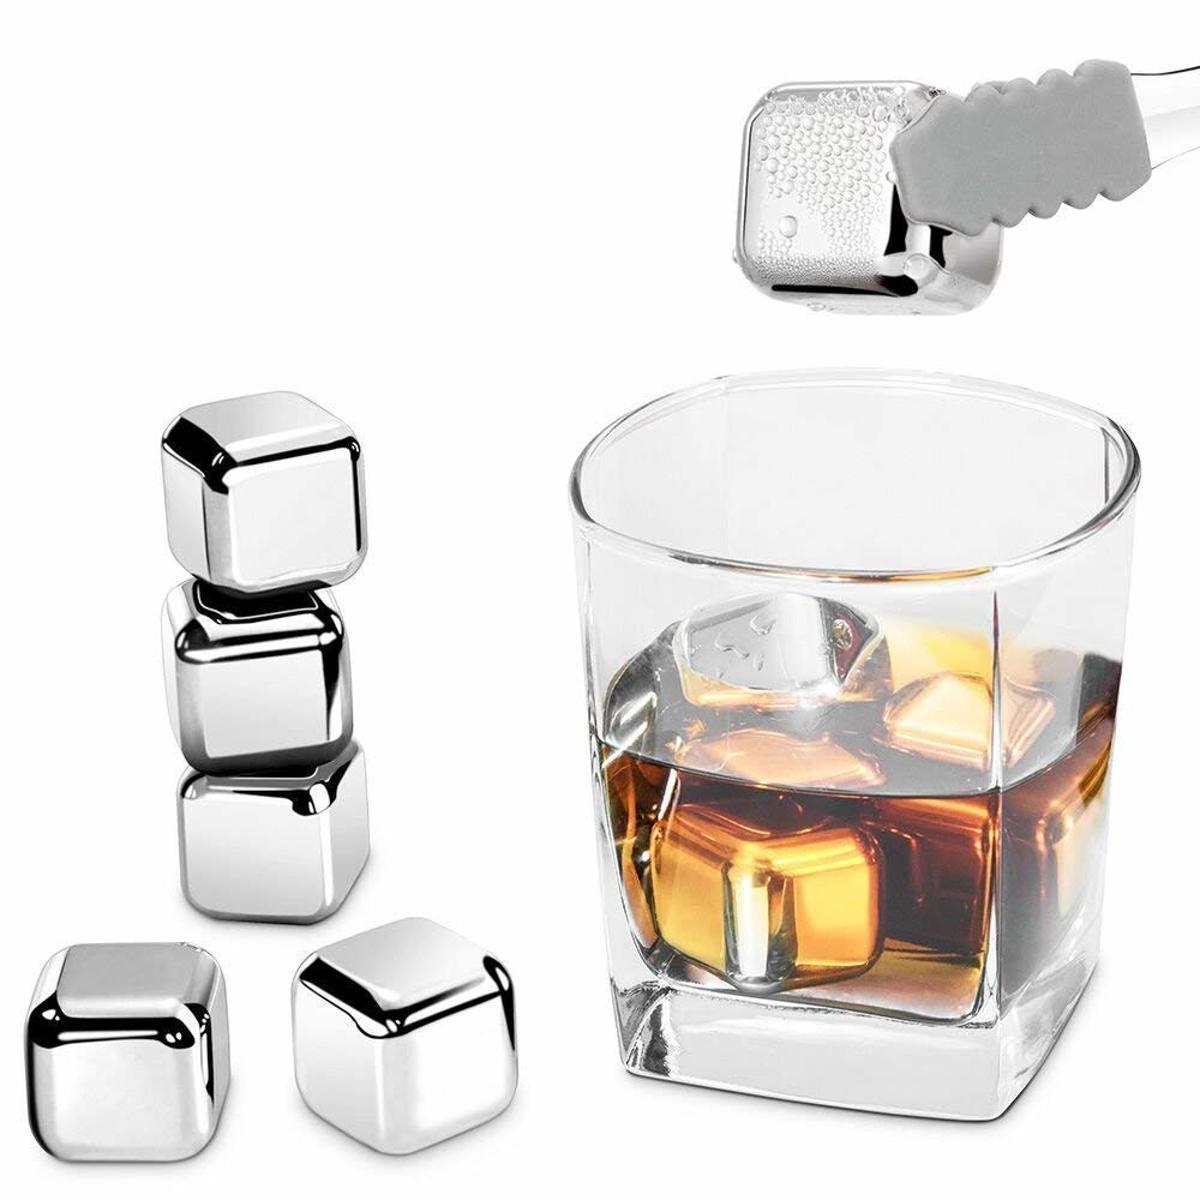 RVS ijsblokjes - set van 6 - whiskey whiskeystones en likeur - ijsblokjes staal kopen